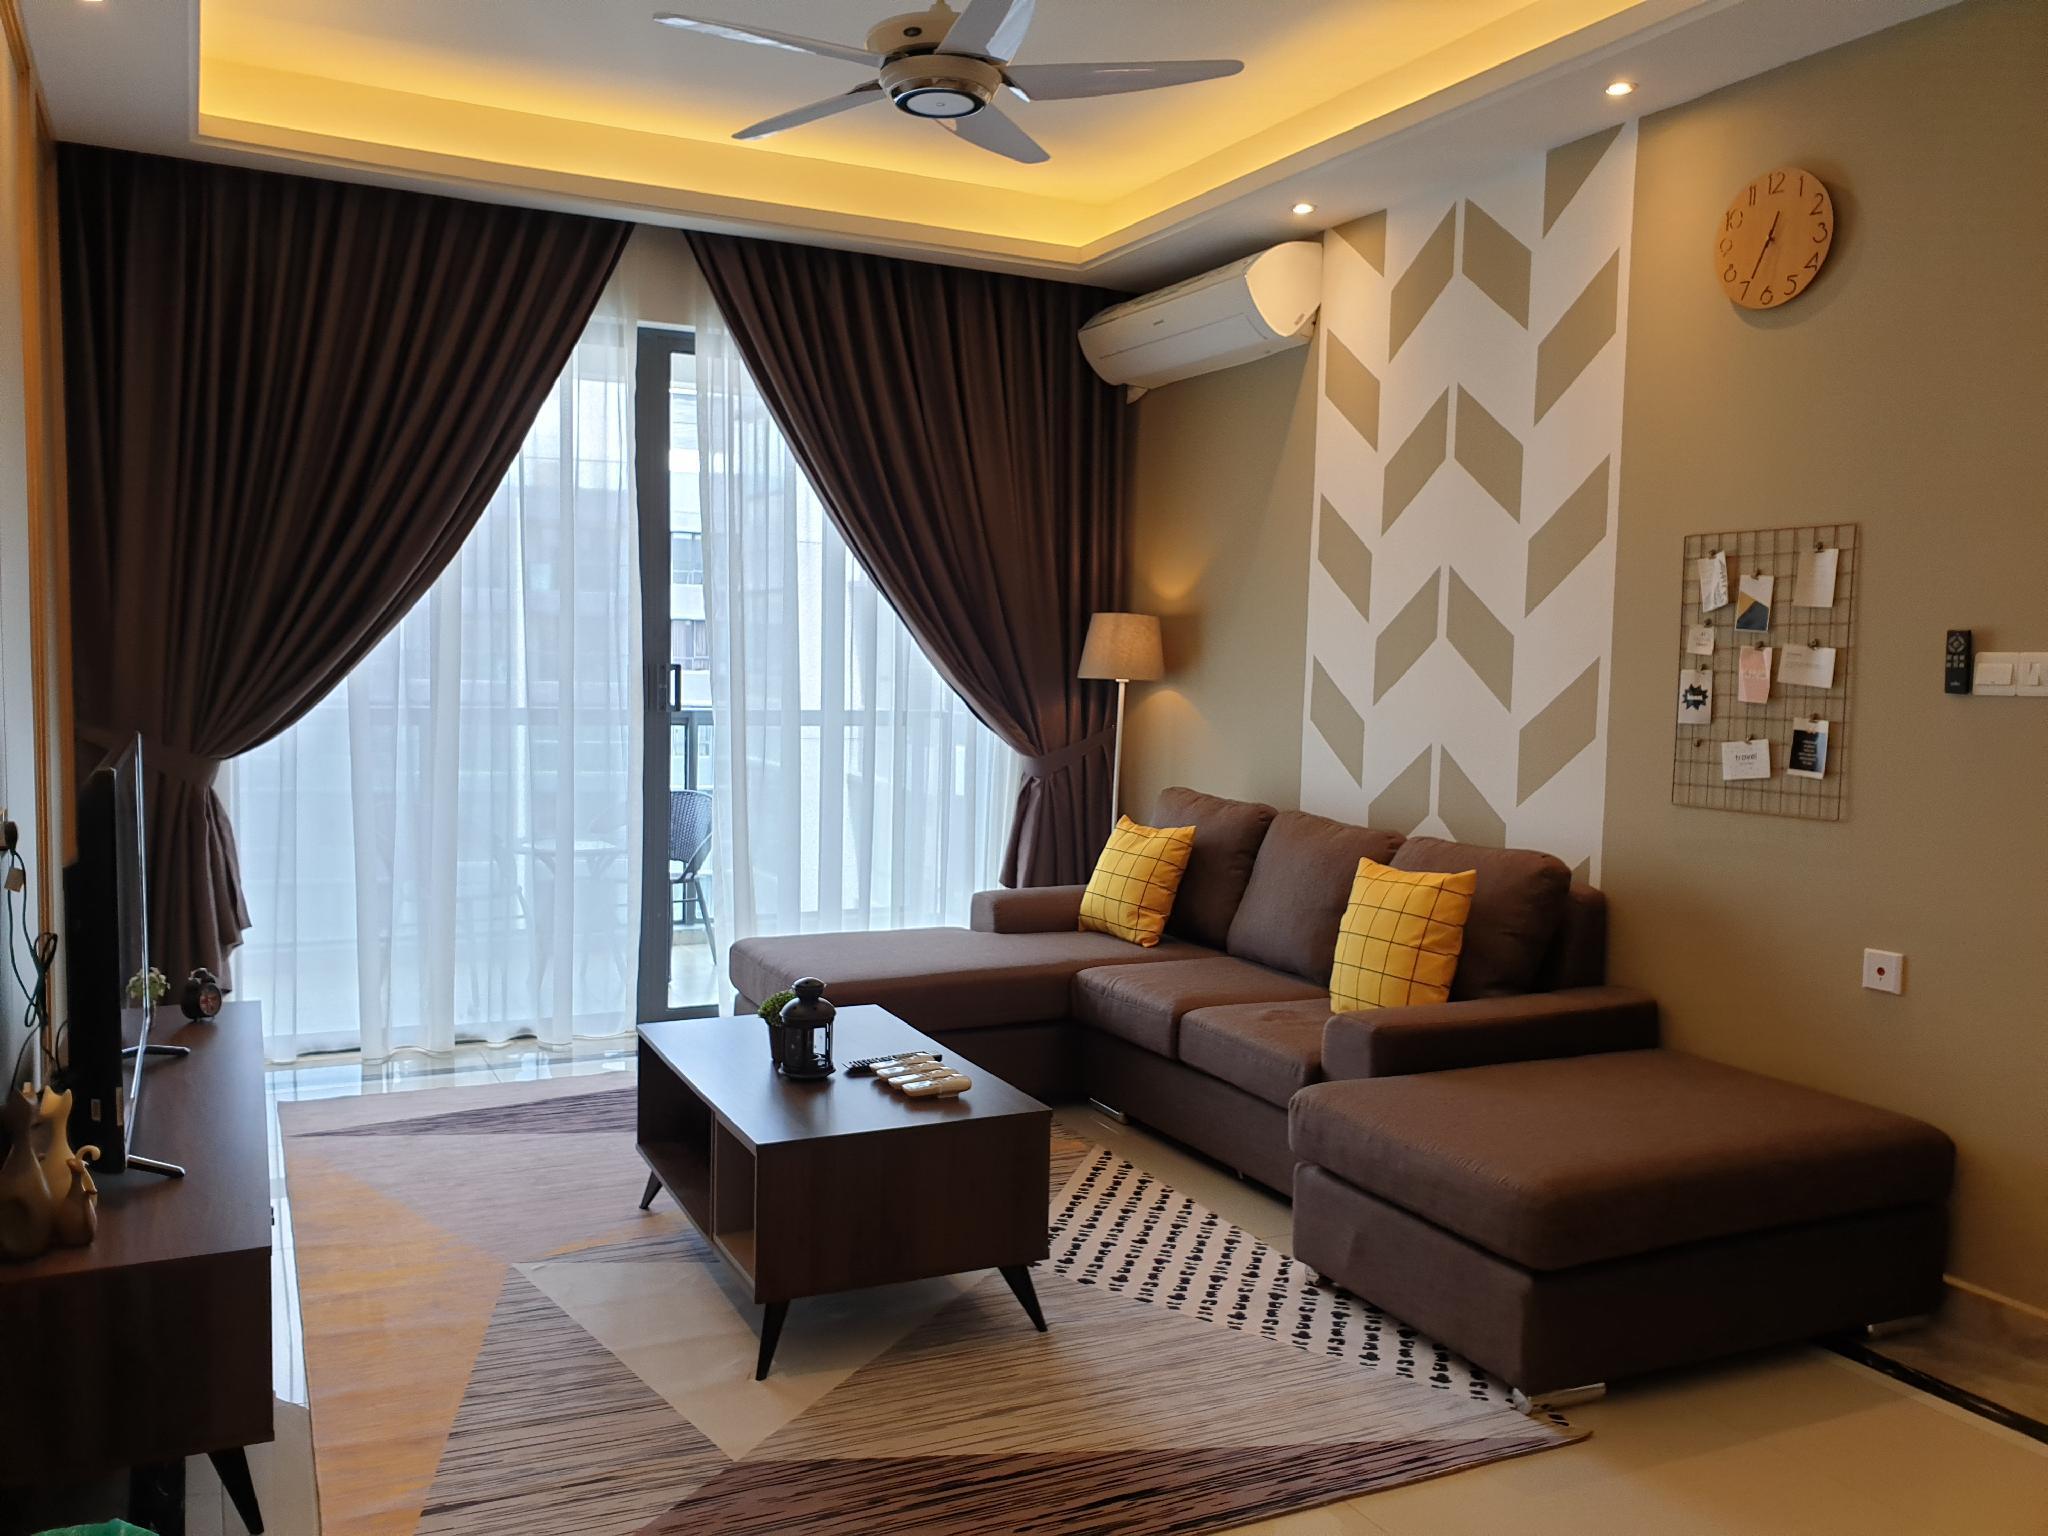 Royal @ RandF Princess Cove Johor CIQ 6PAX